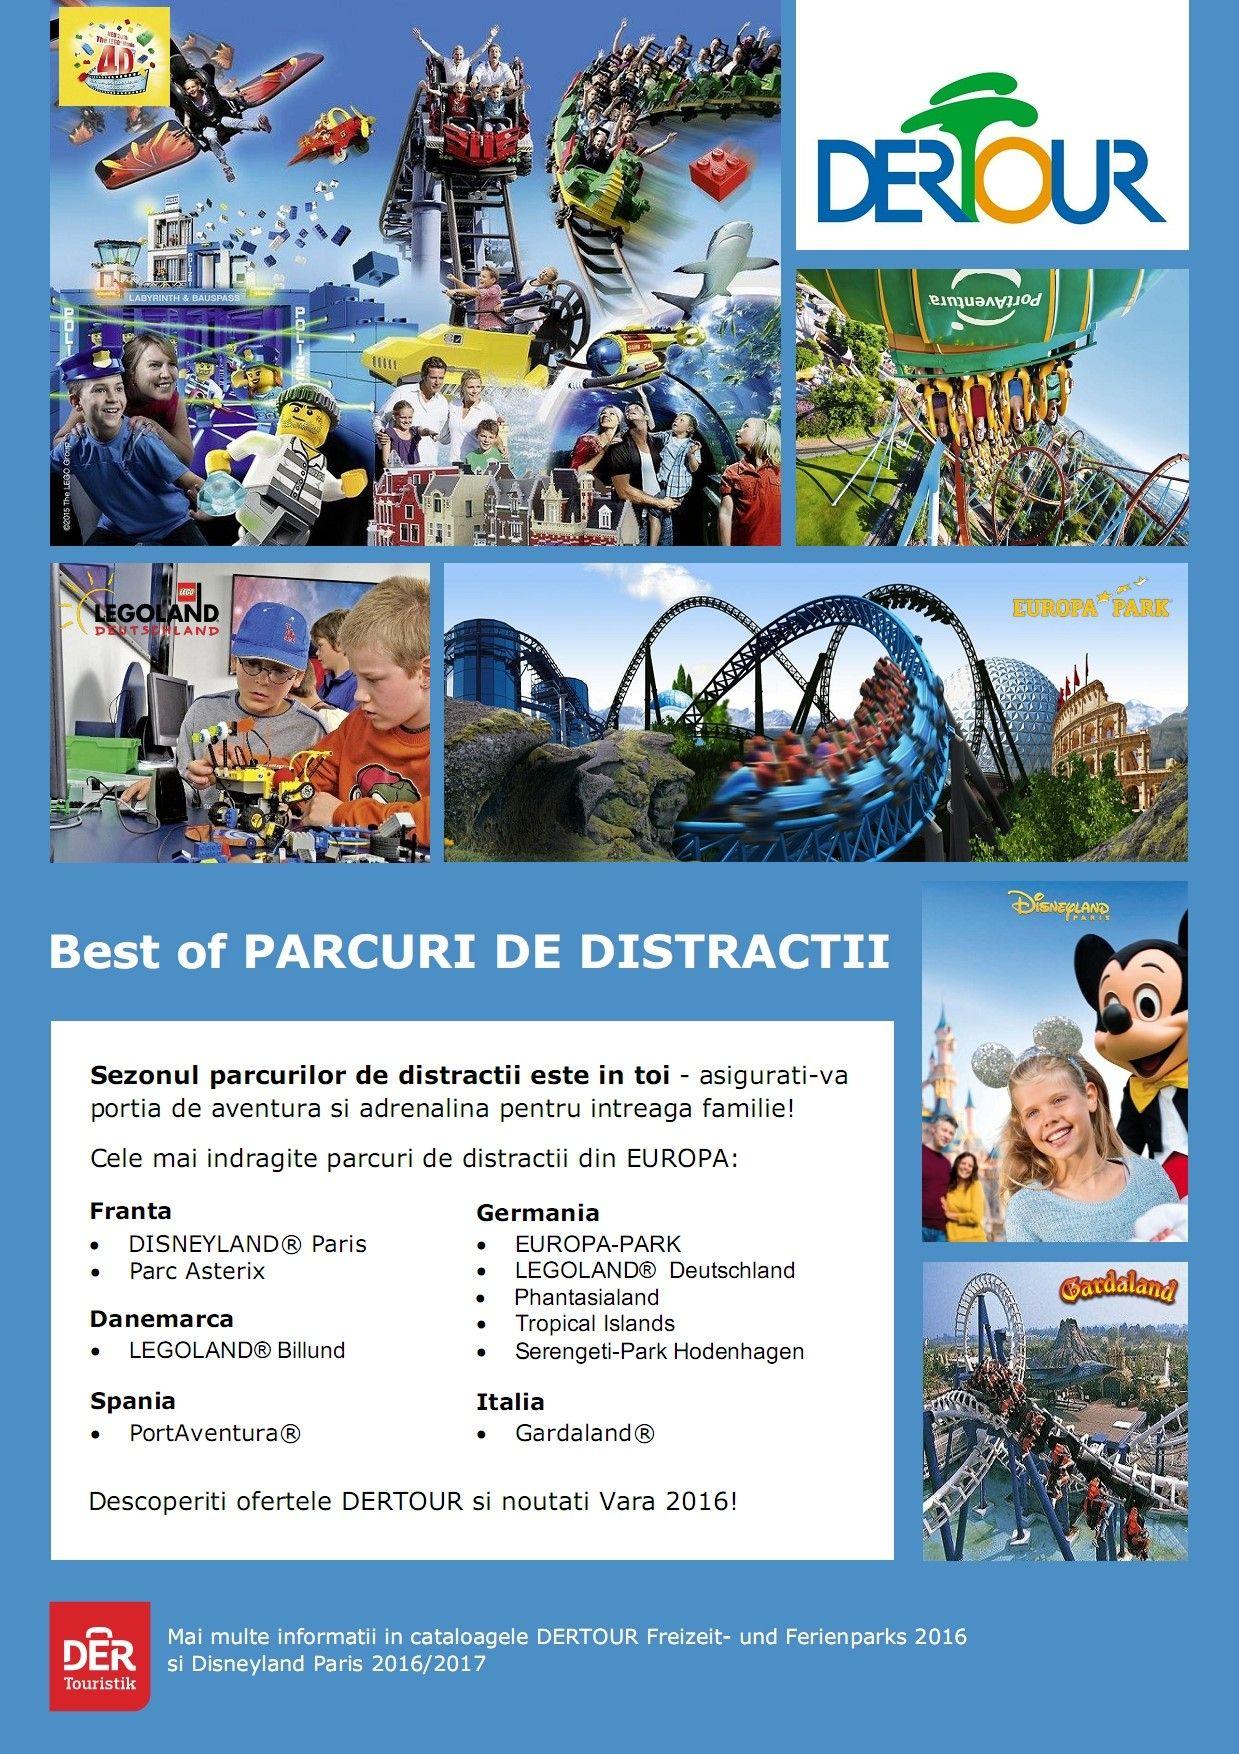 Sezonul parcurilor de distractii este in toi! Best of PARCURI DE DISTRACTII - International, Europa - Rezerva acum! http://bit.ly/1MEYn6t